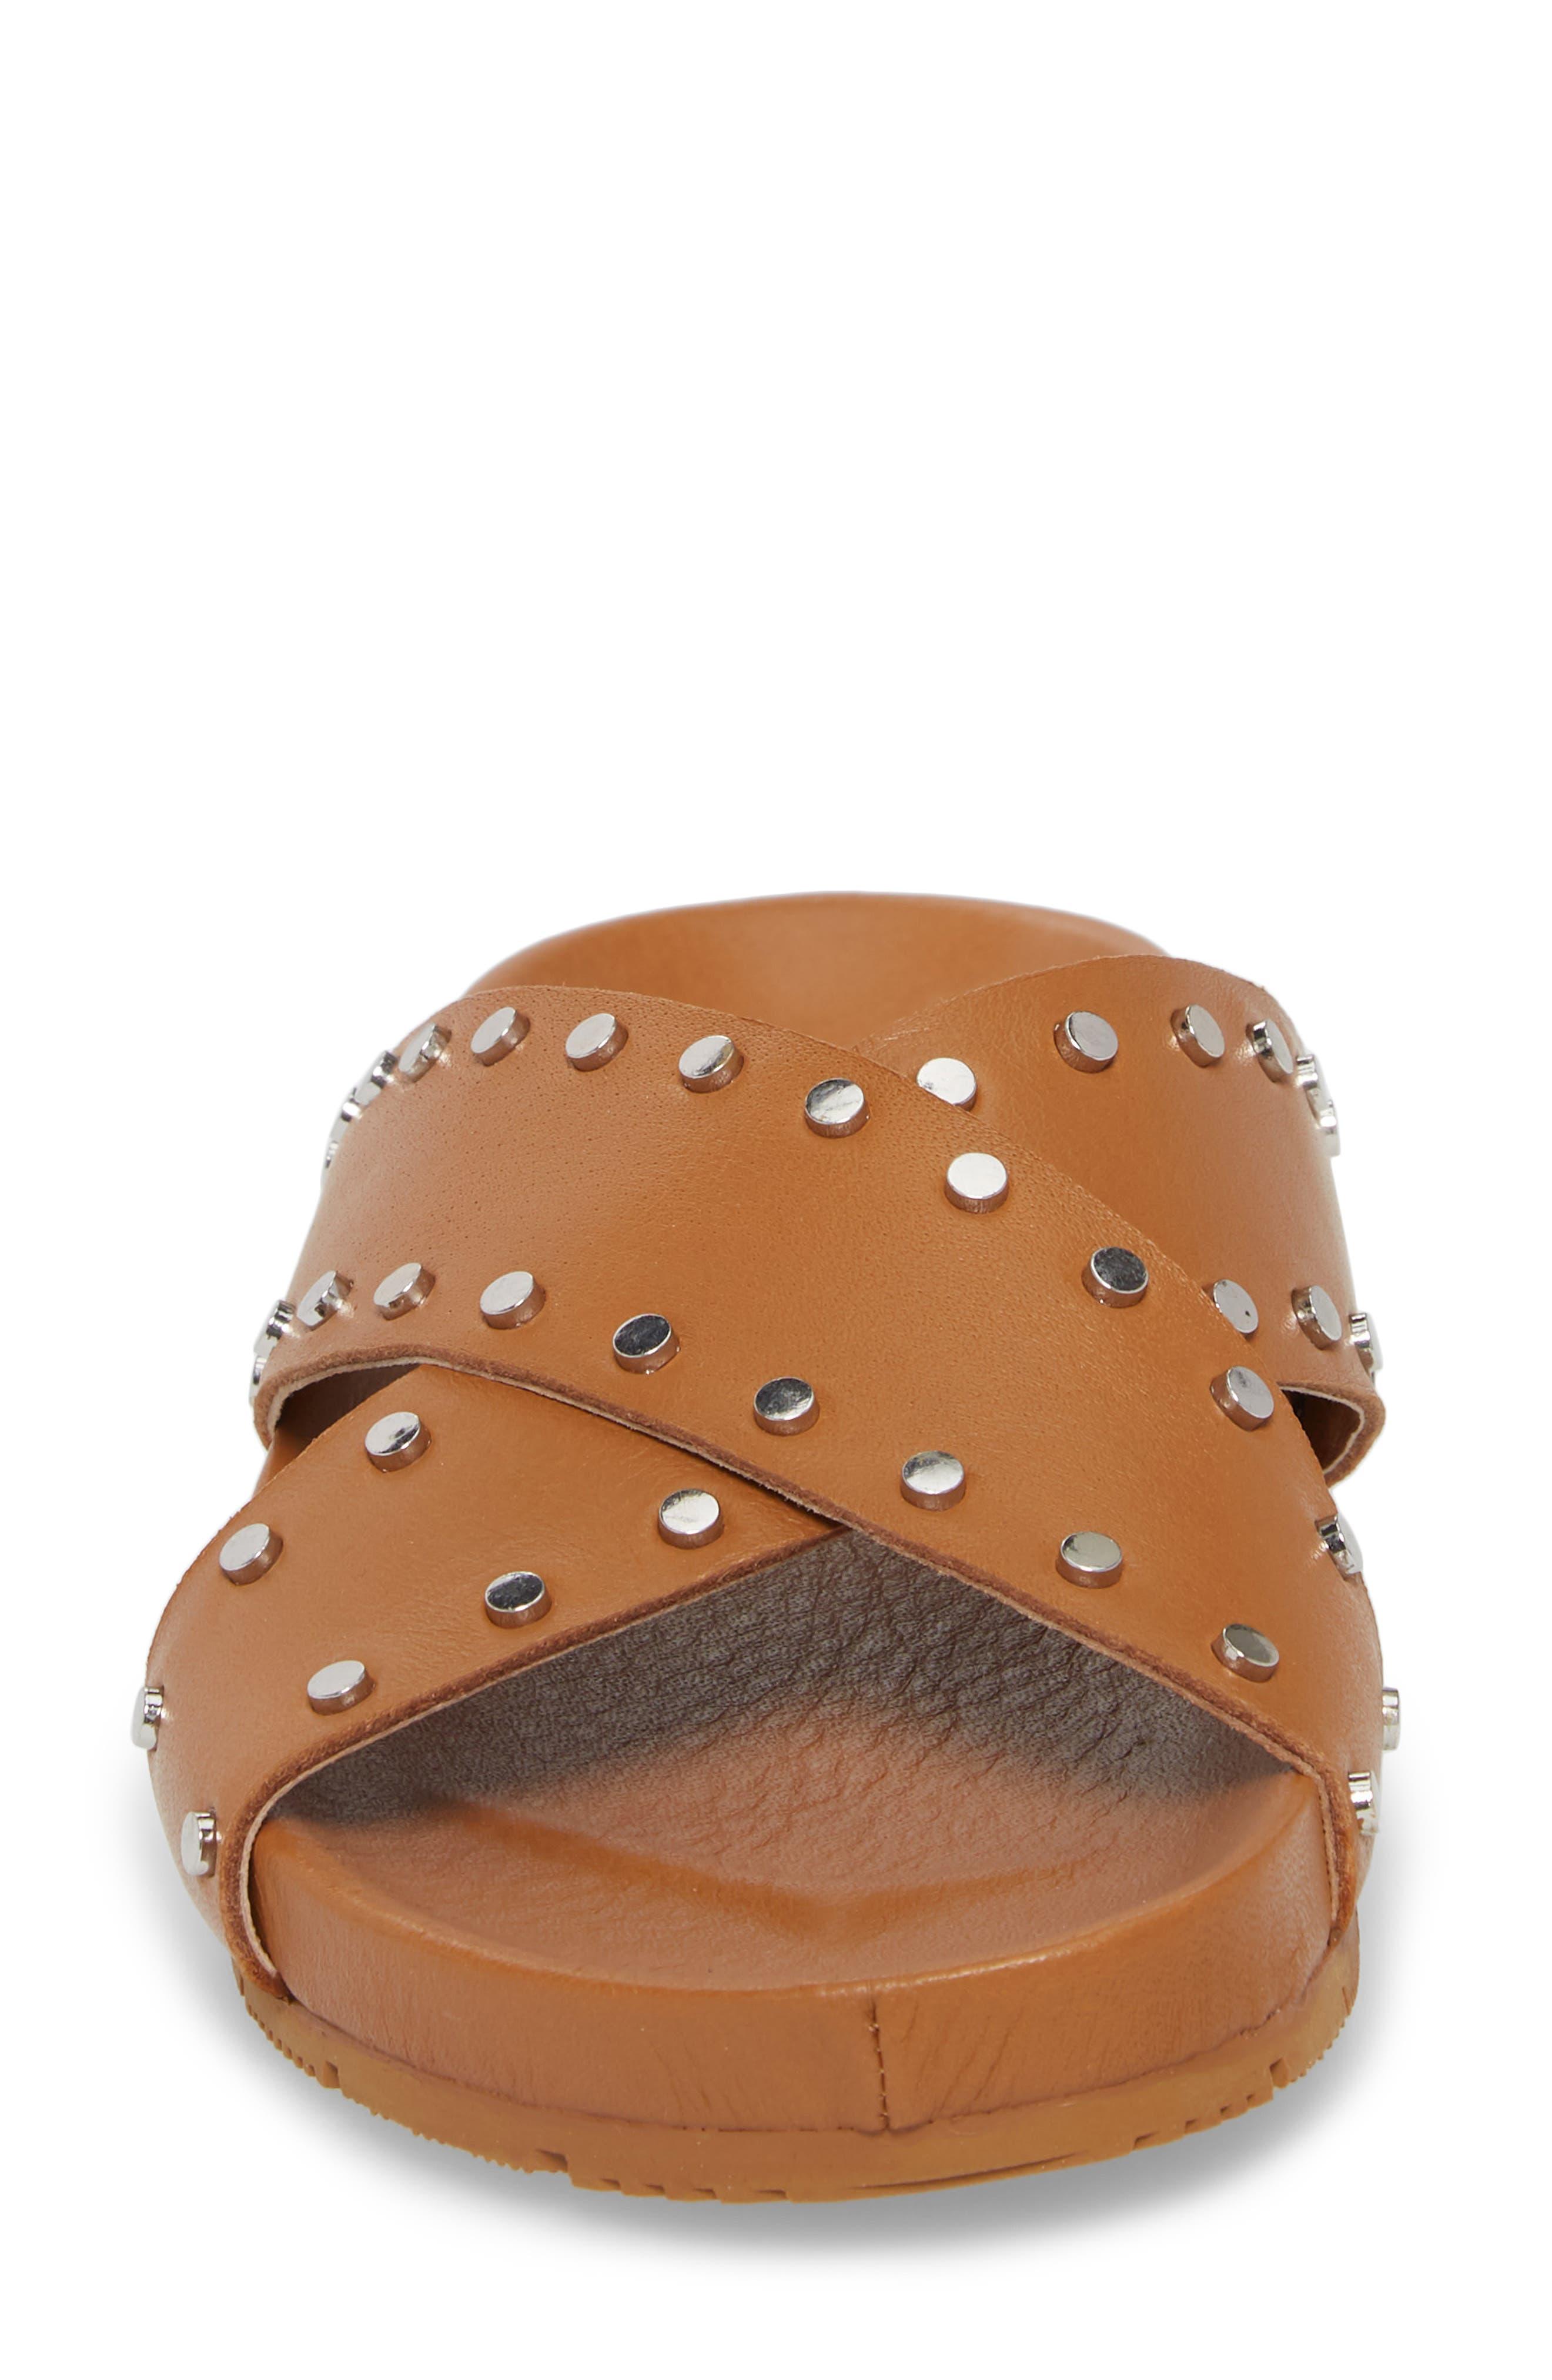 Ellie Studded Slide Sandal,                             Alternate thumbnail 4, color,                             Tan Leather